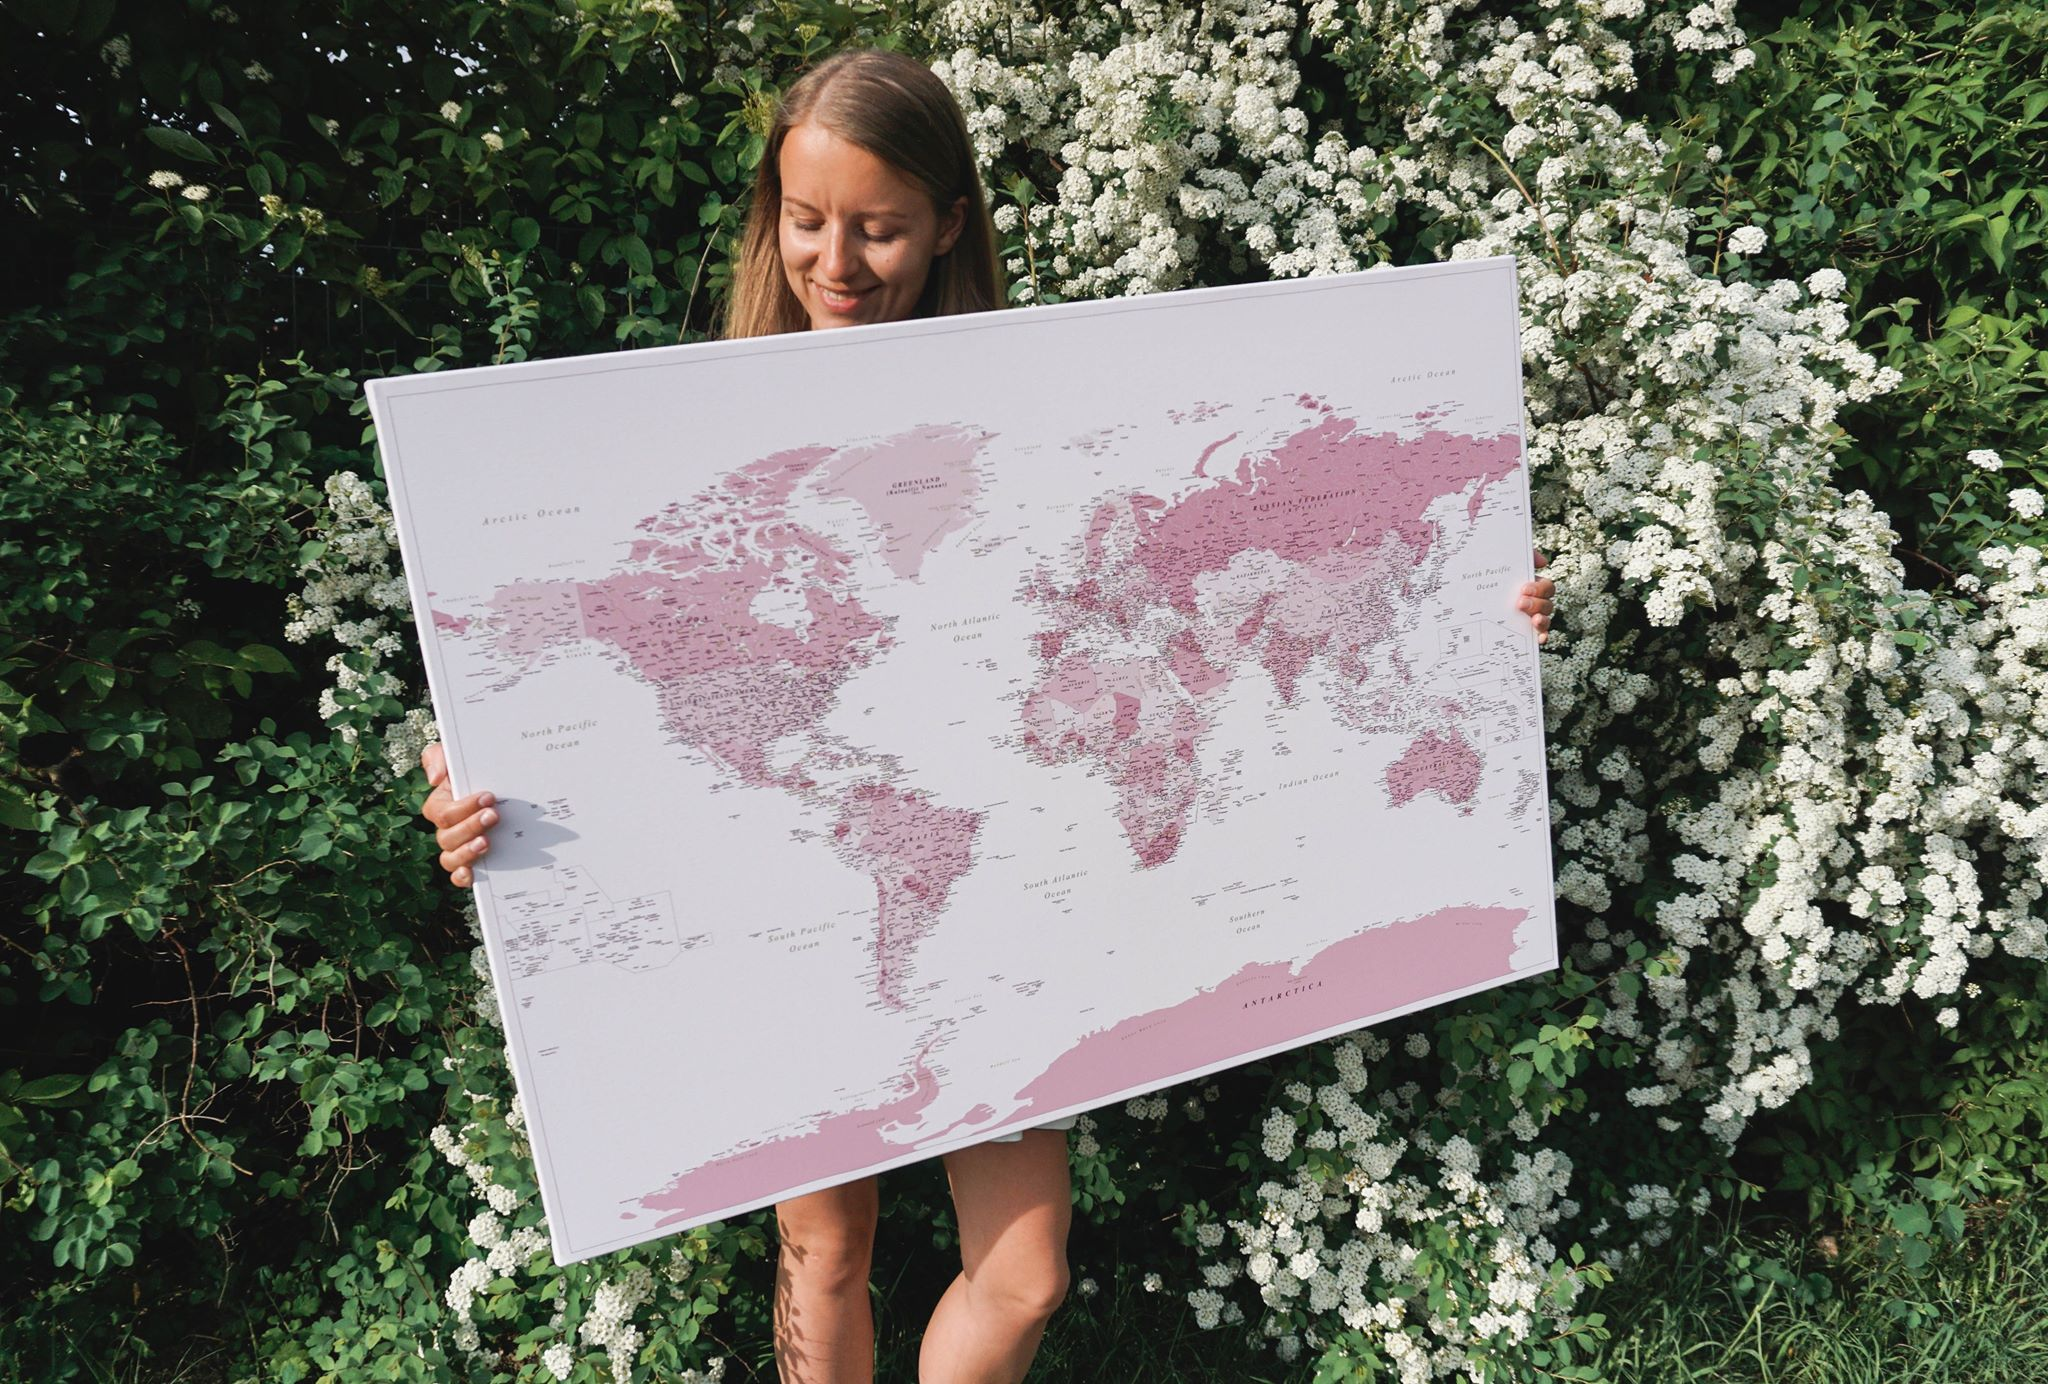 Pinnwand-Weltkarten-Leinwand-rosa